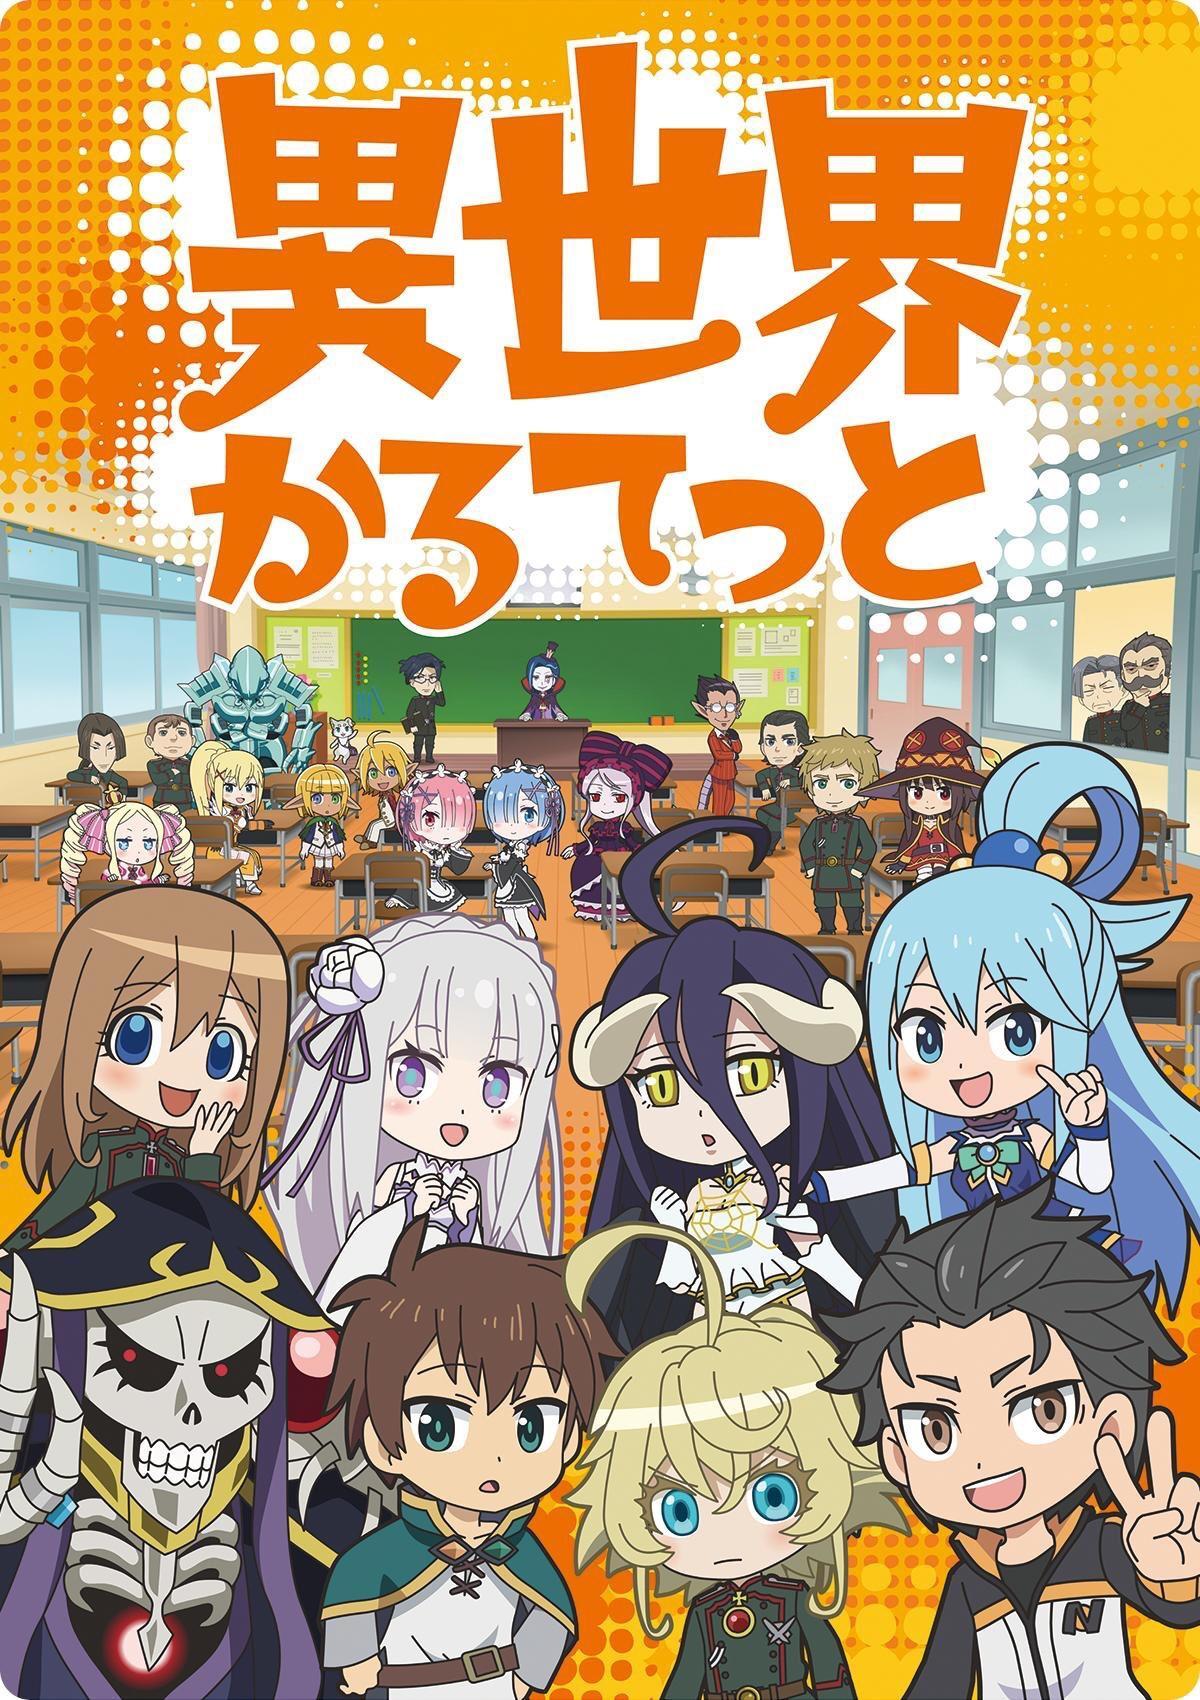 TVアニメ「異世界かるてっと」キービジュアル